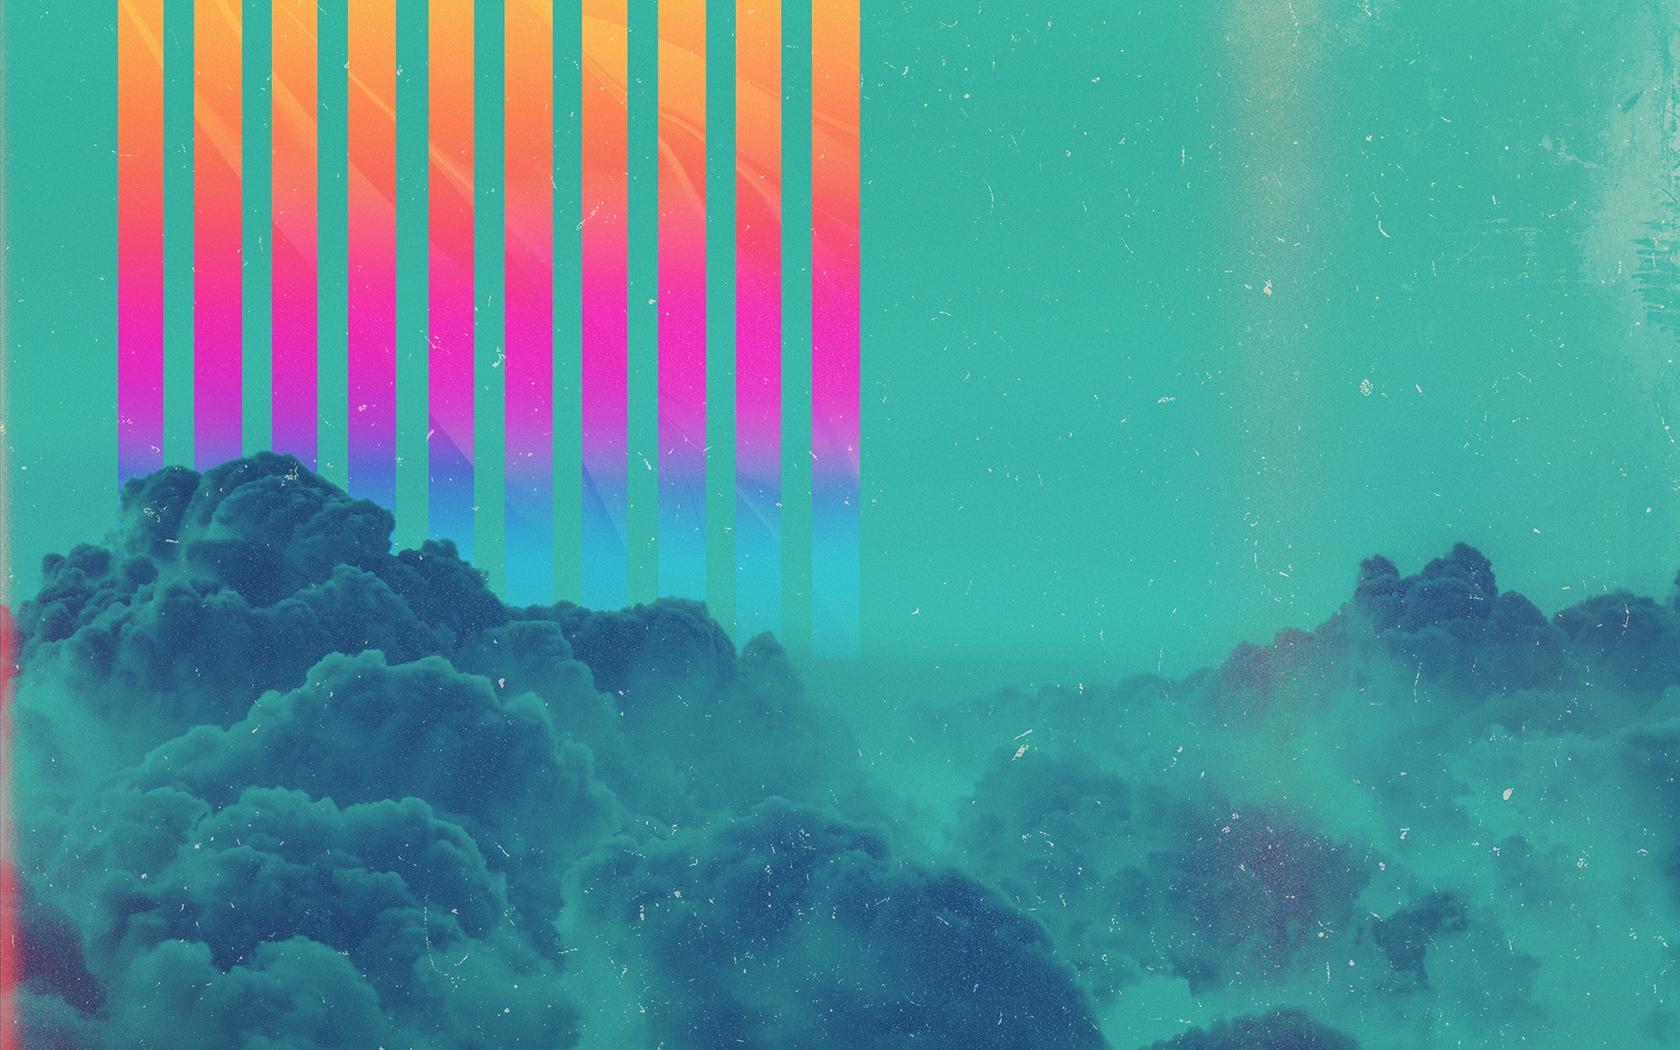 Stripped sky_Wallpaper by Shorsh.jpg